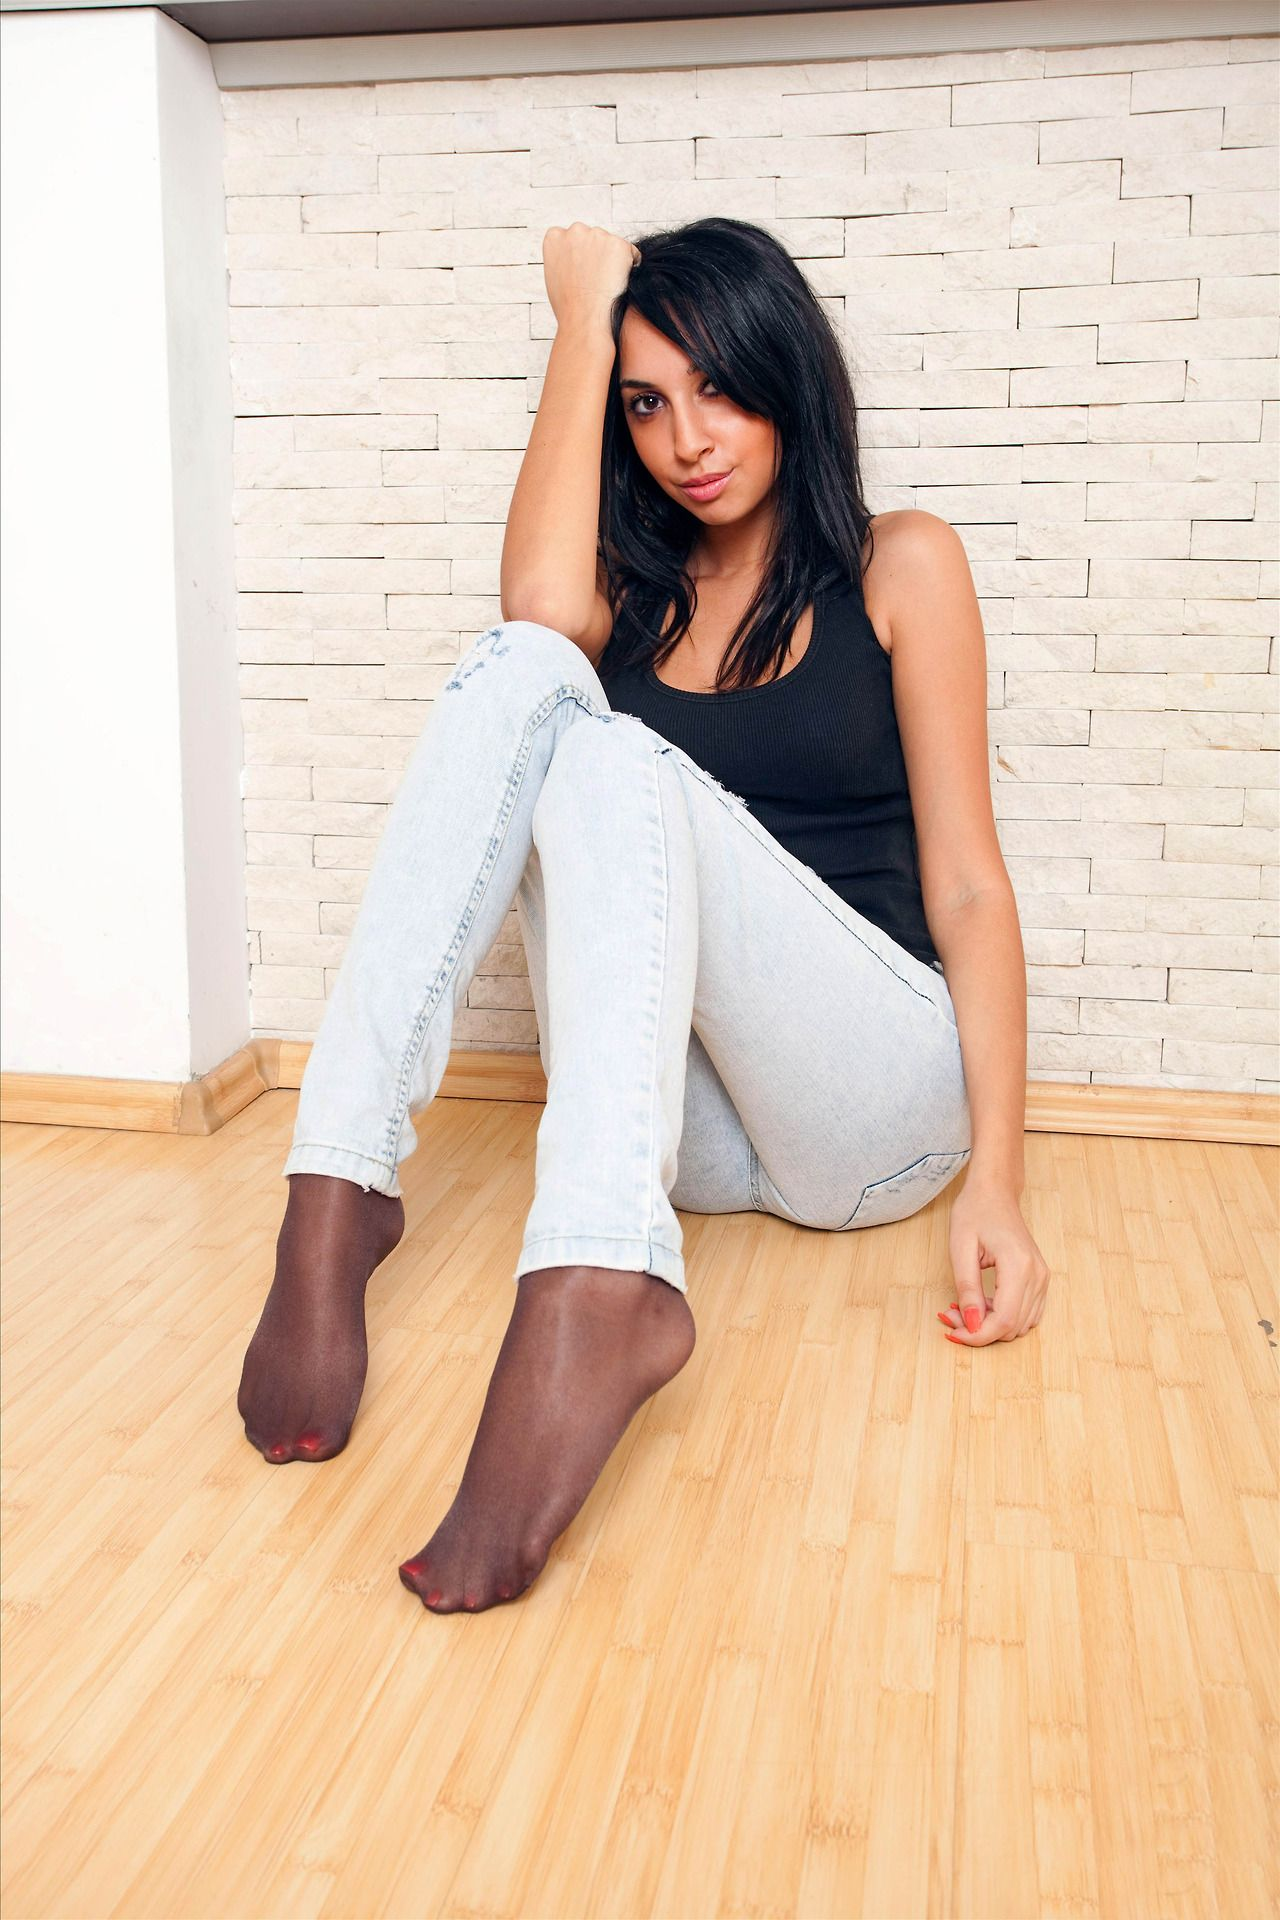 As seen on Legs.BZ website. | Legs, Feet, Nylons